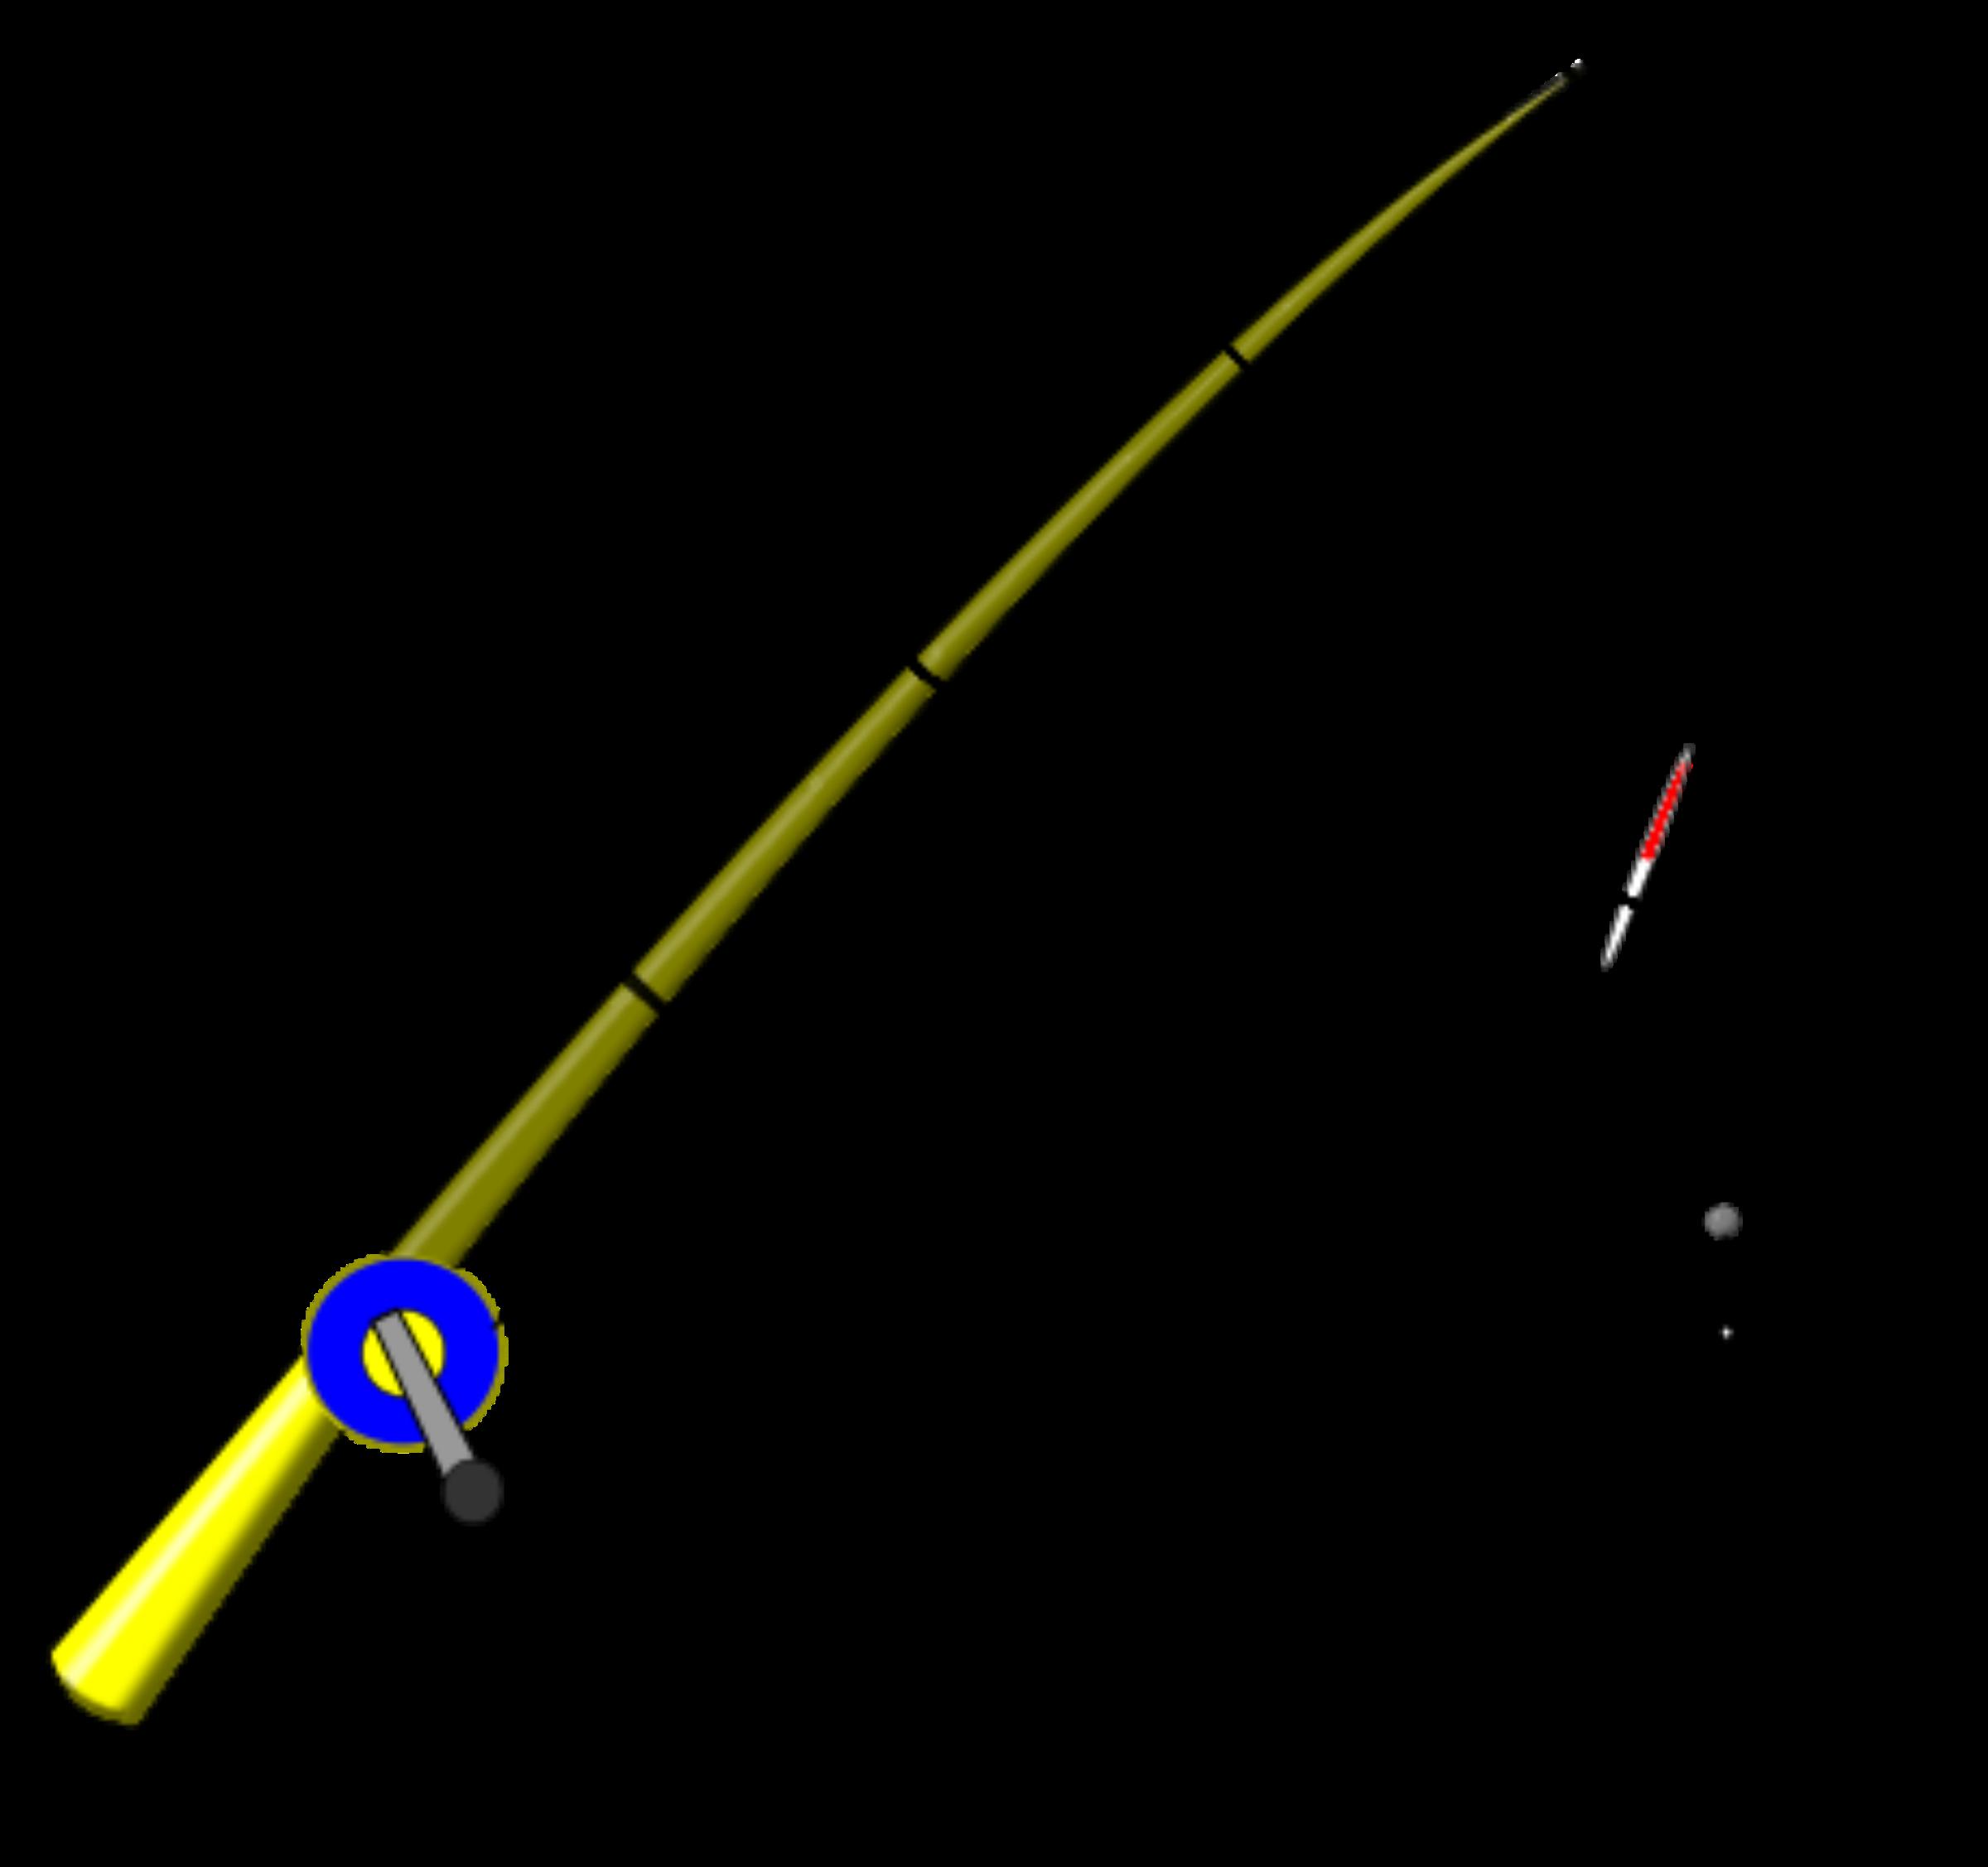 Lines clipart fishing pole Pole rod fishing Fishing clip